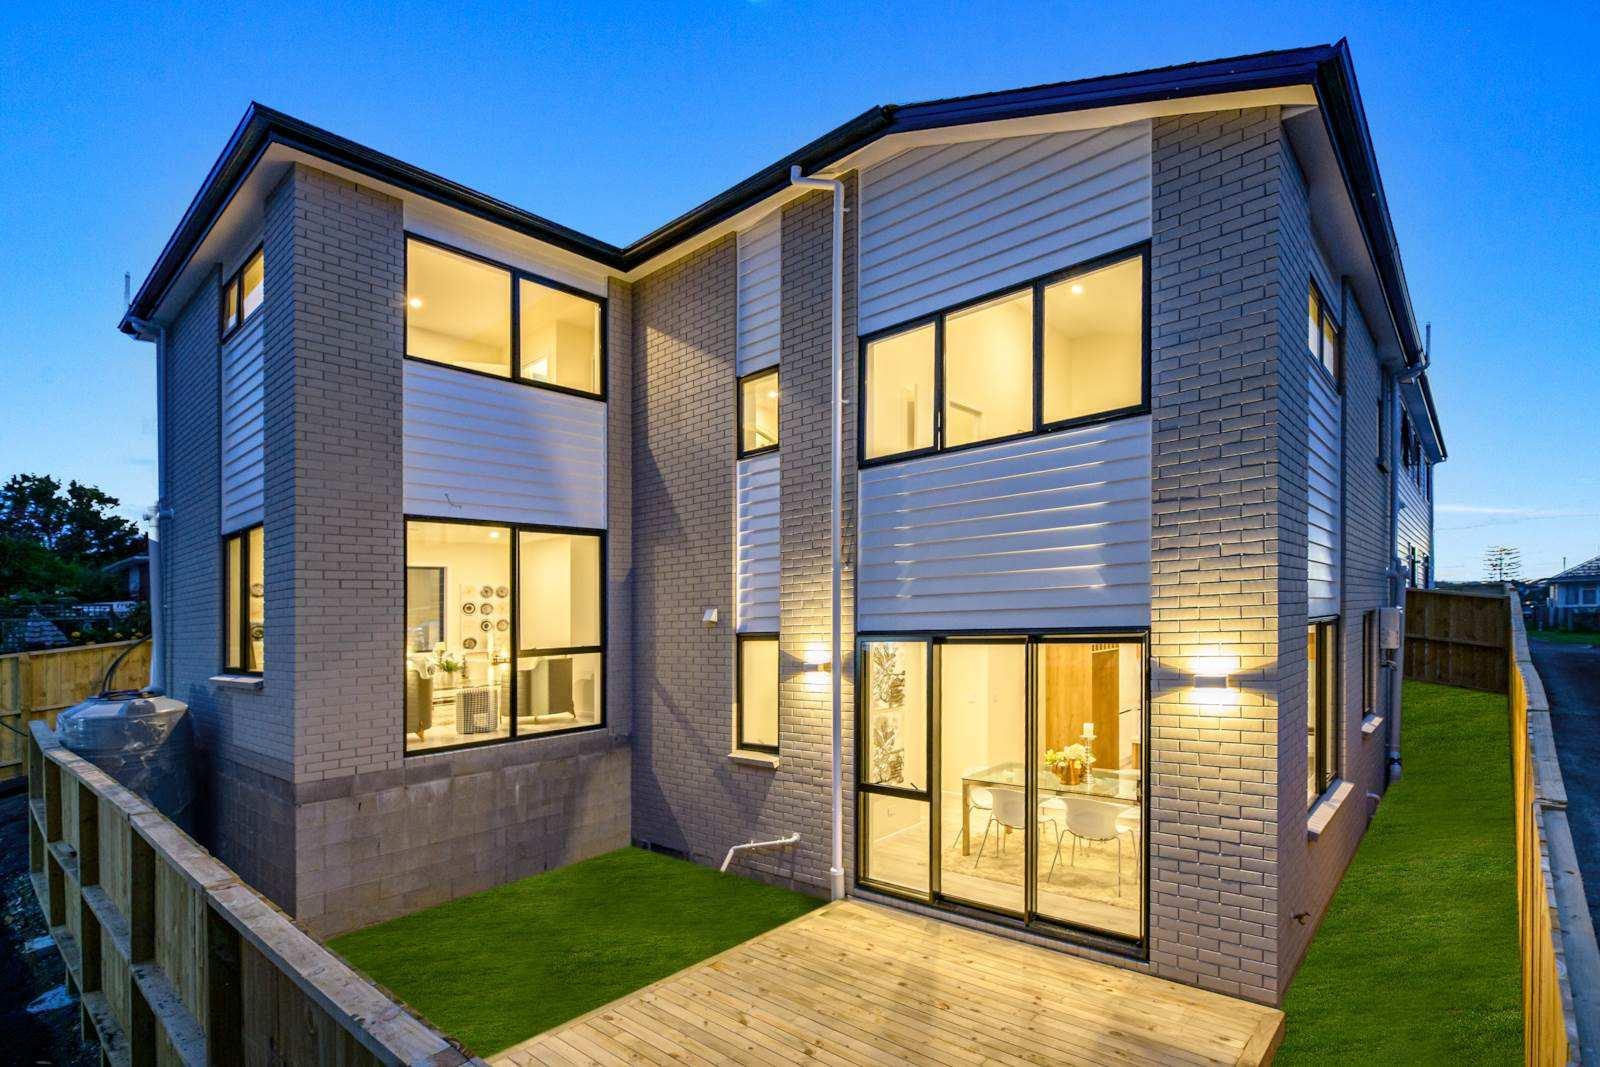 Mount Roskill 4房 全新时尚奢墅 超高性价比 10年建筑质保 商圈&交通兼备 吸引万千瞩目! Affordable, Brand New, Stylish & Luxurious!